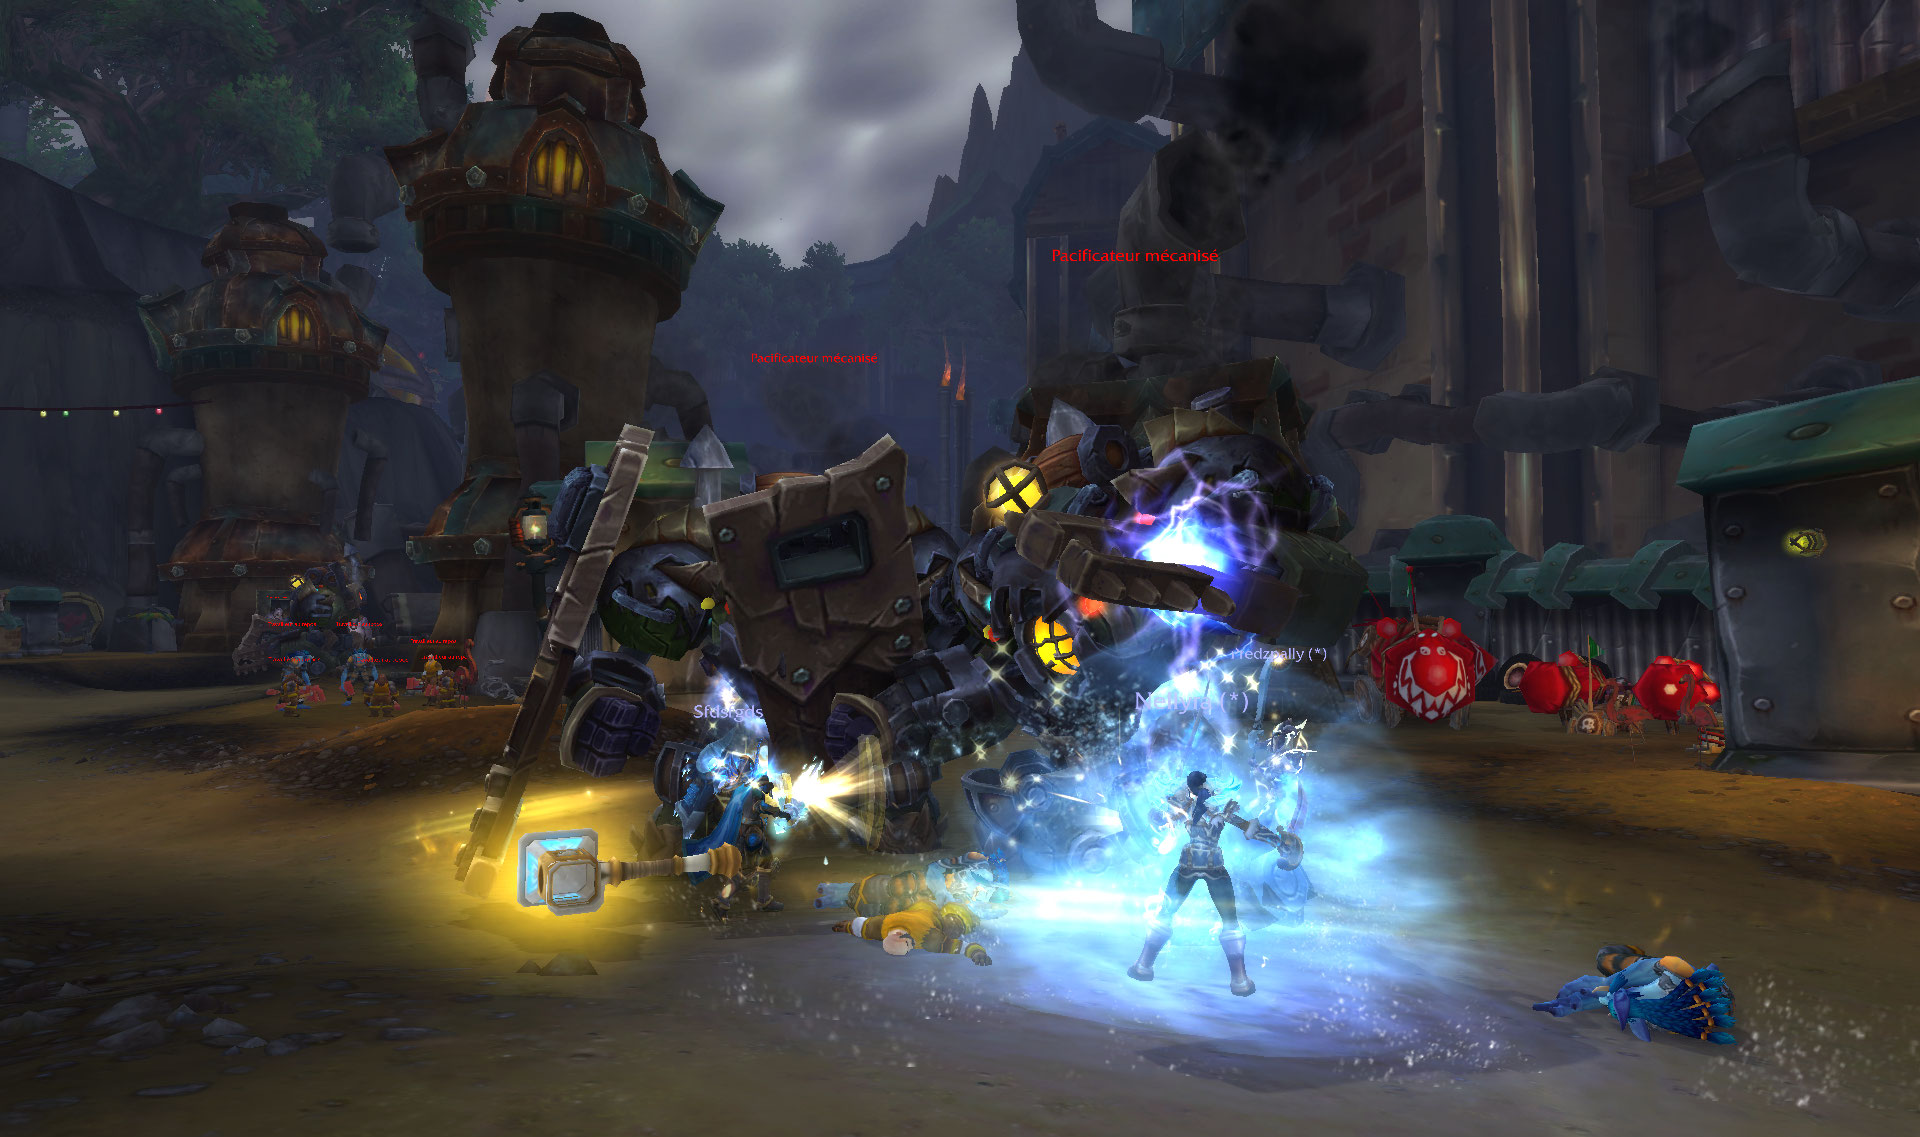 Screenshot du donjon Terremine dans World of Warcraft: Battle for Azeroth.